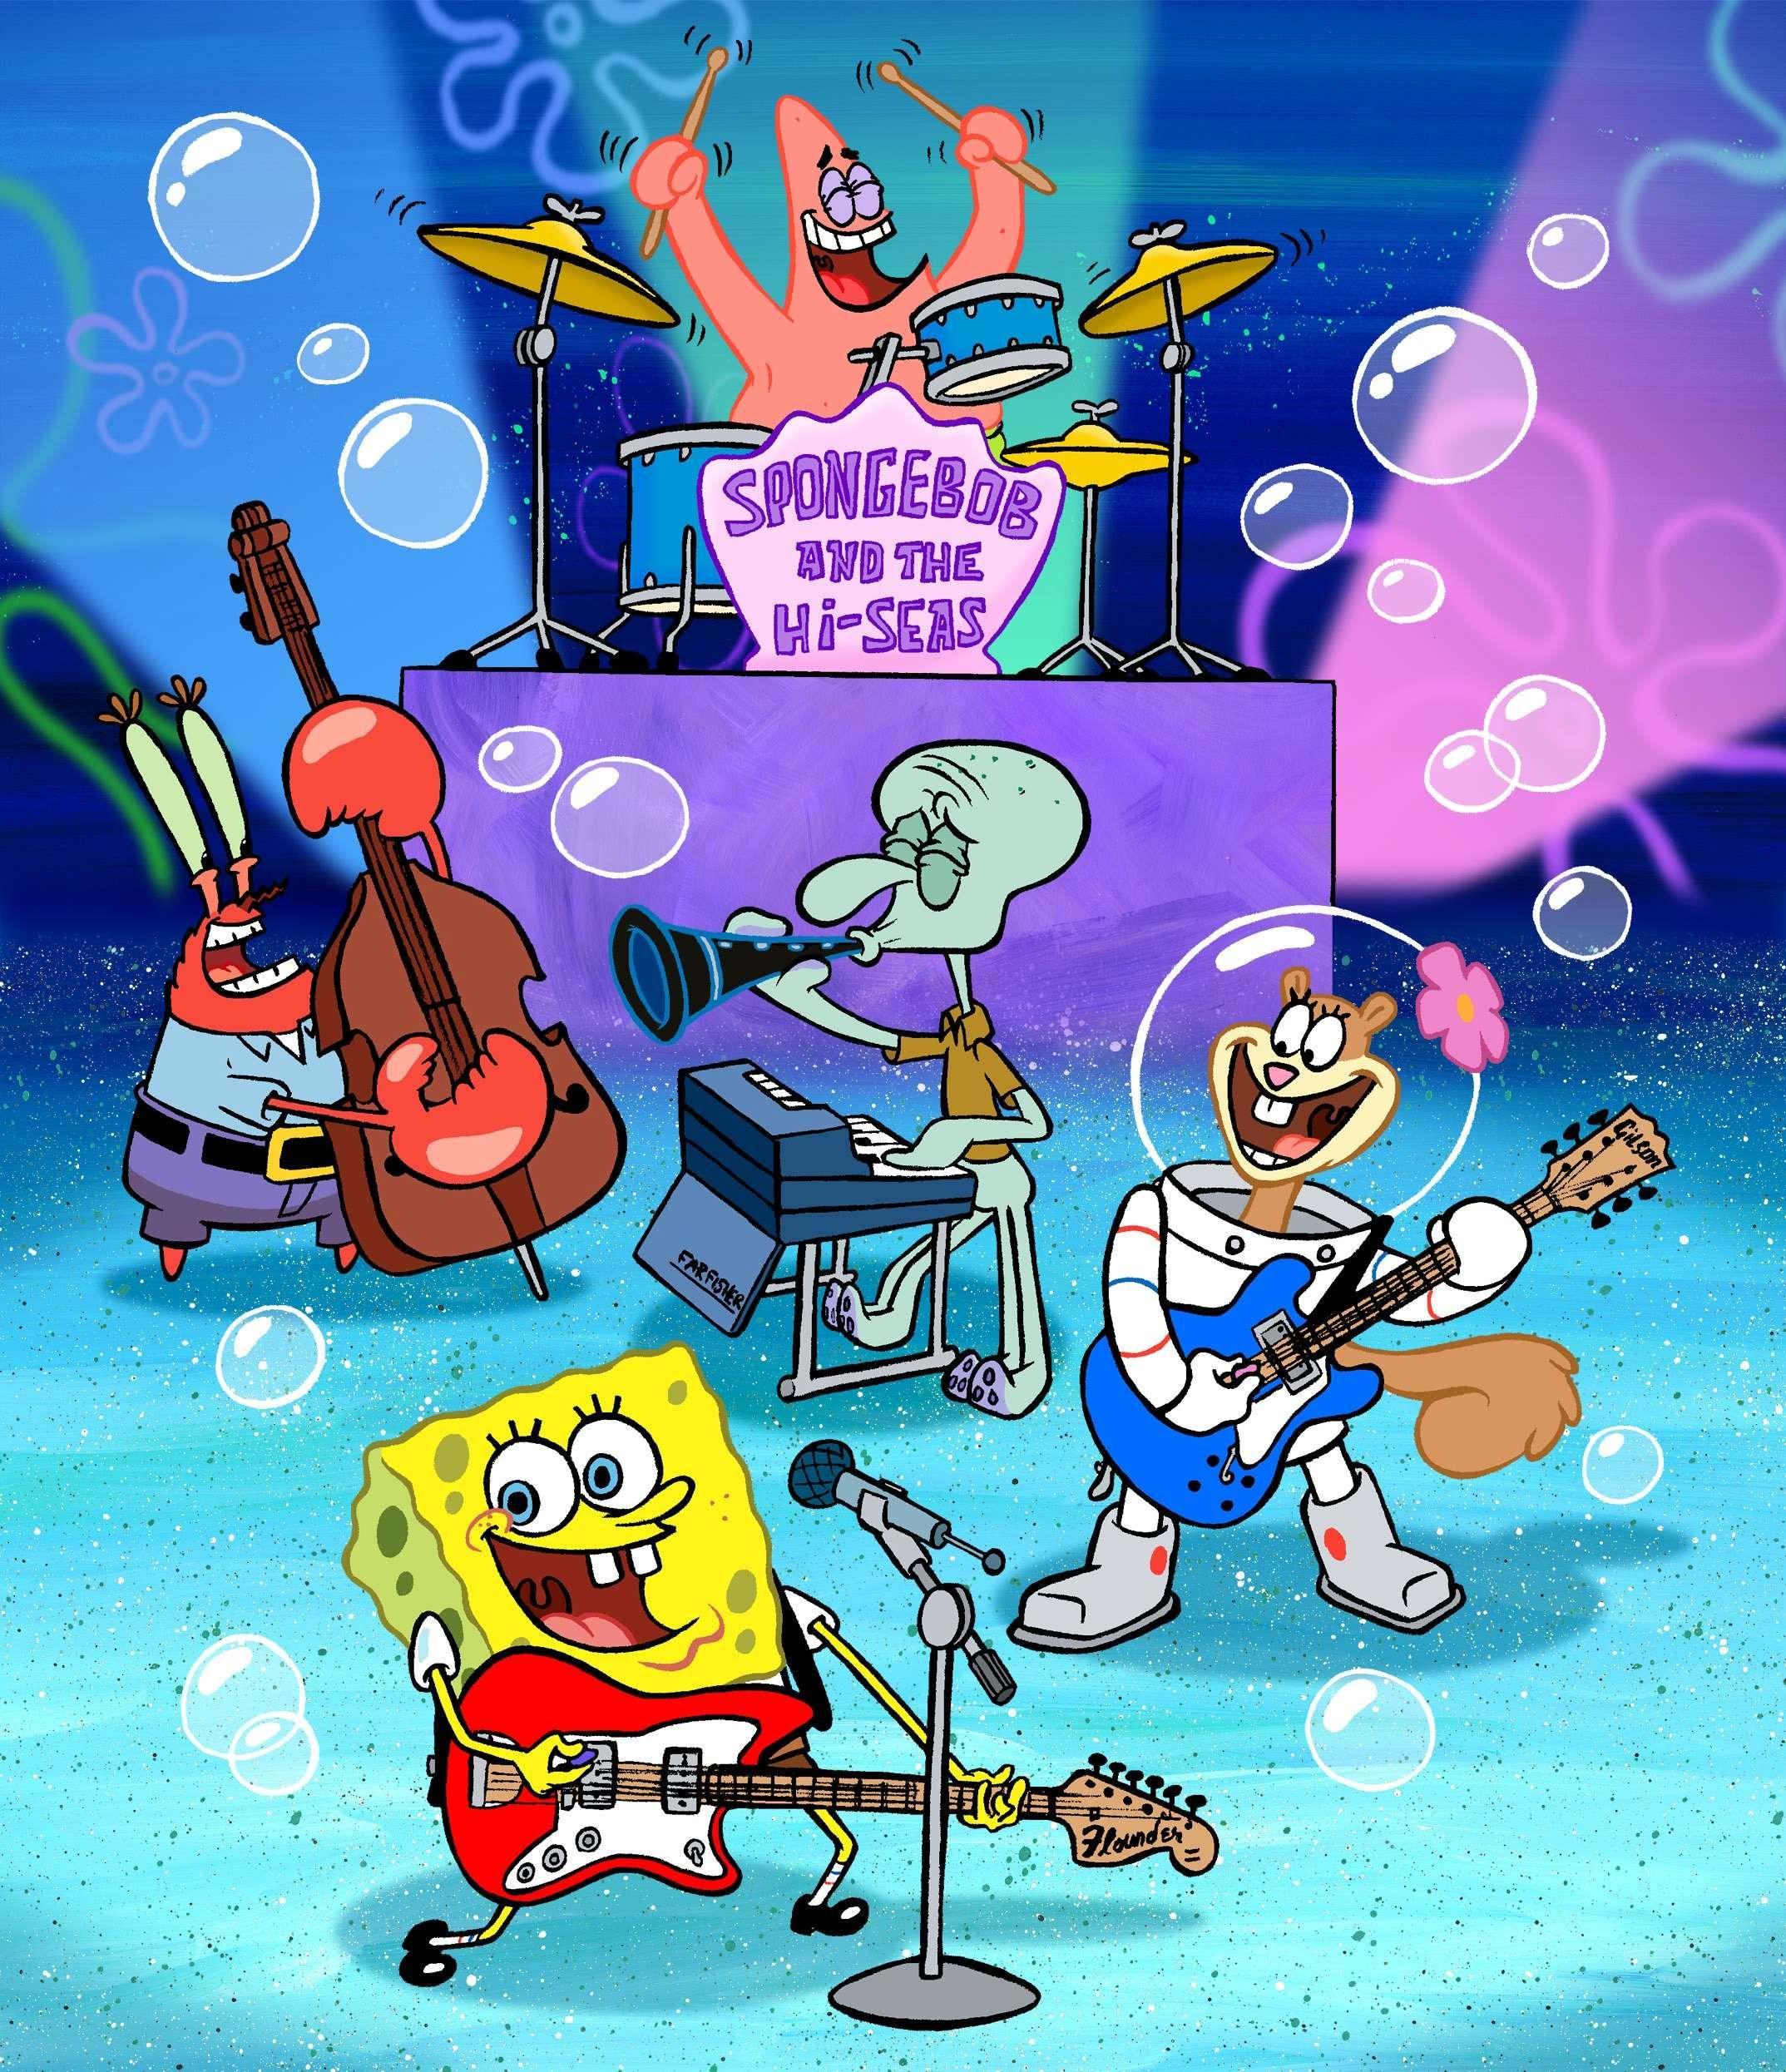 Uncategorized Spongebob And His Friends spongebob squarepants and friends tattoos that i love friends